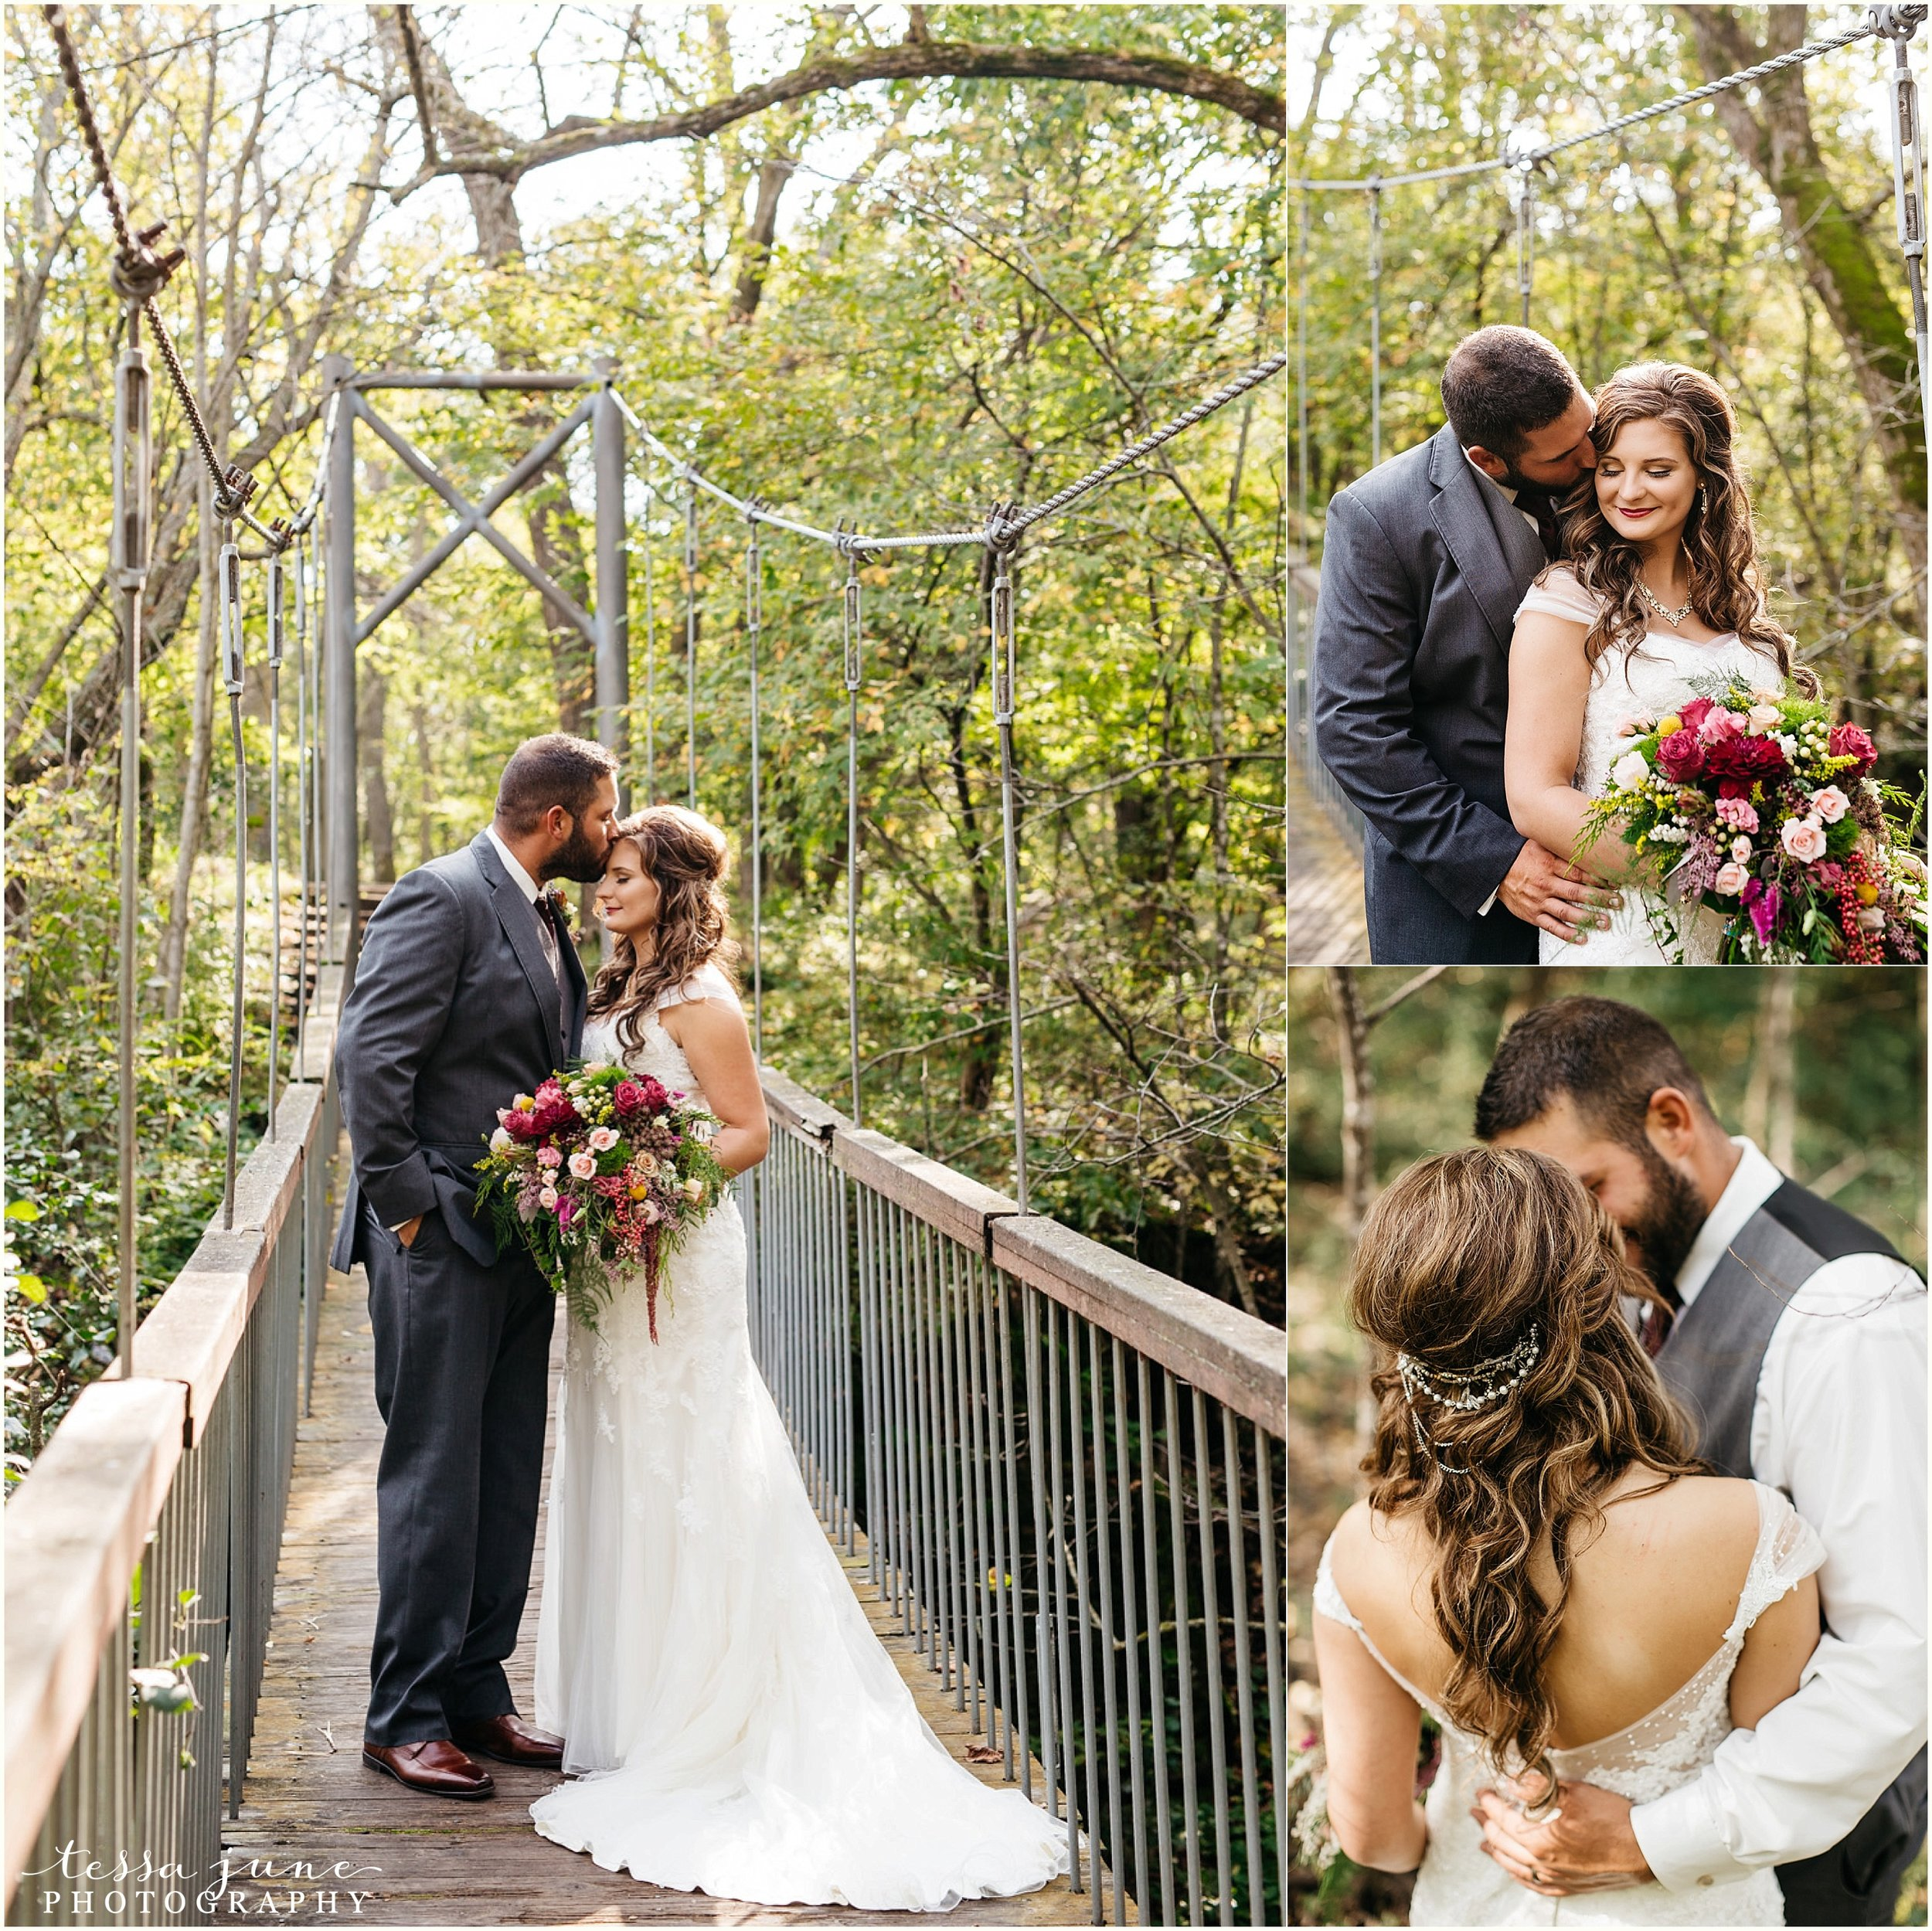 bohemian-minnesota-wedding-mismatched-bridesmaid-dresses-waterfall-st-cloud-tessa-june-photography-44.jpg